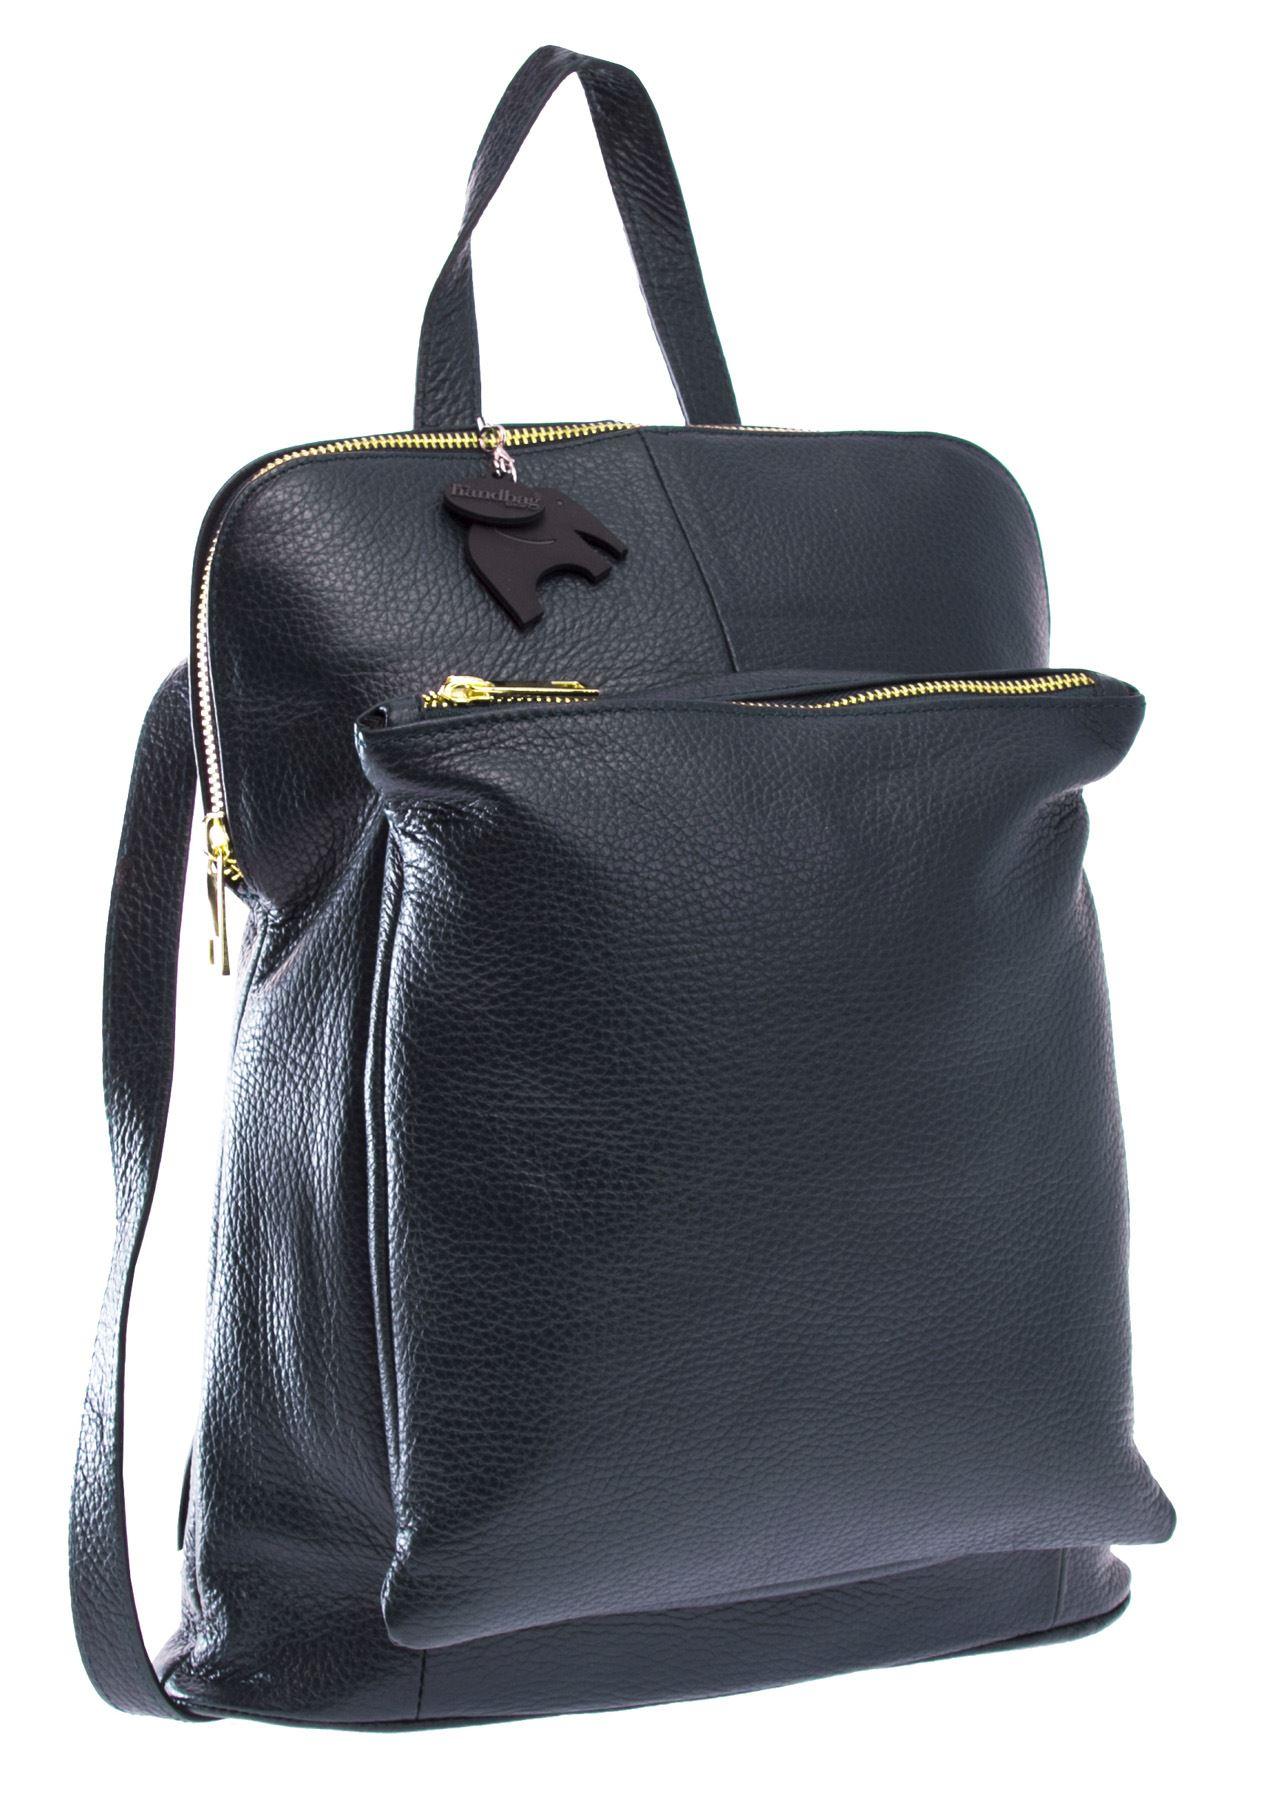 Handbag Womens Genuine Leather Medium Convertible